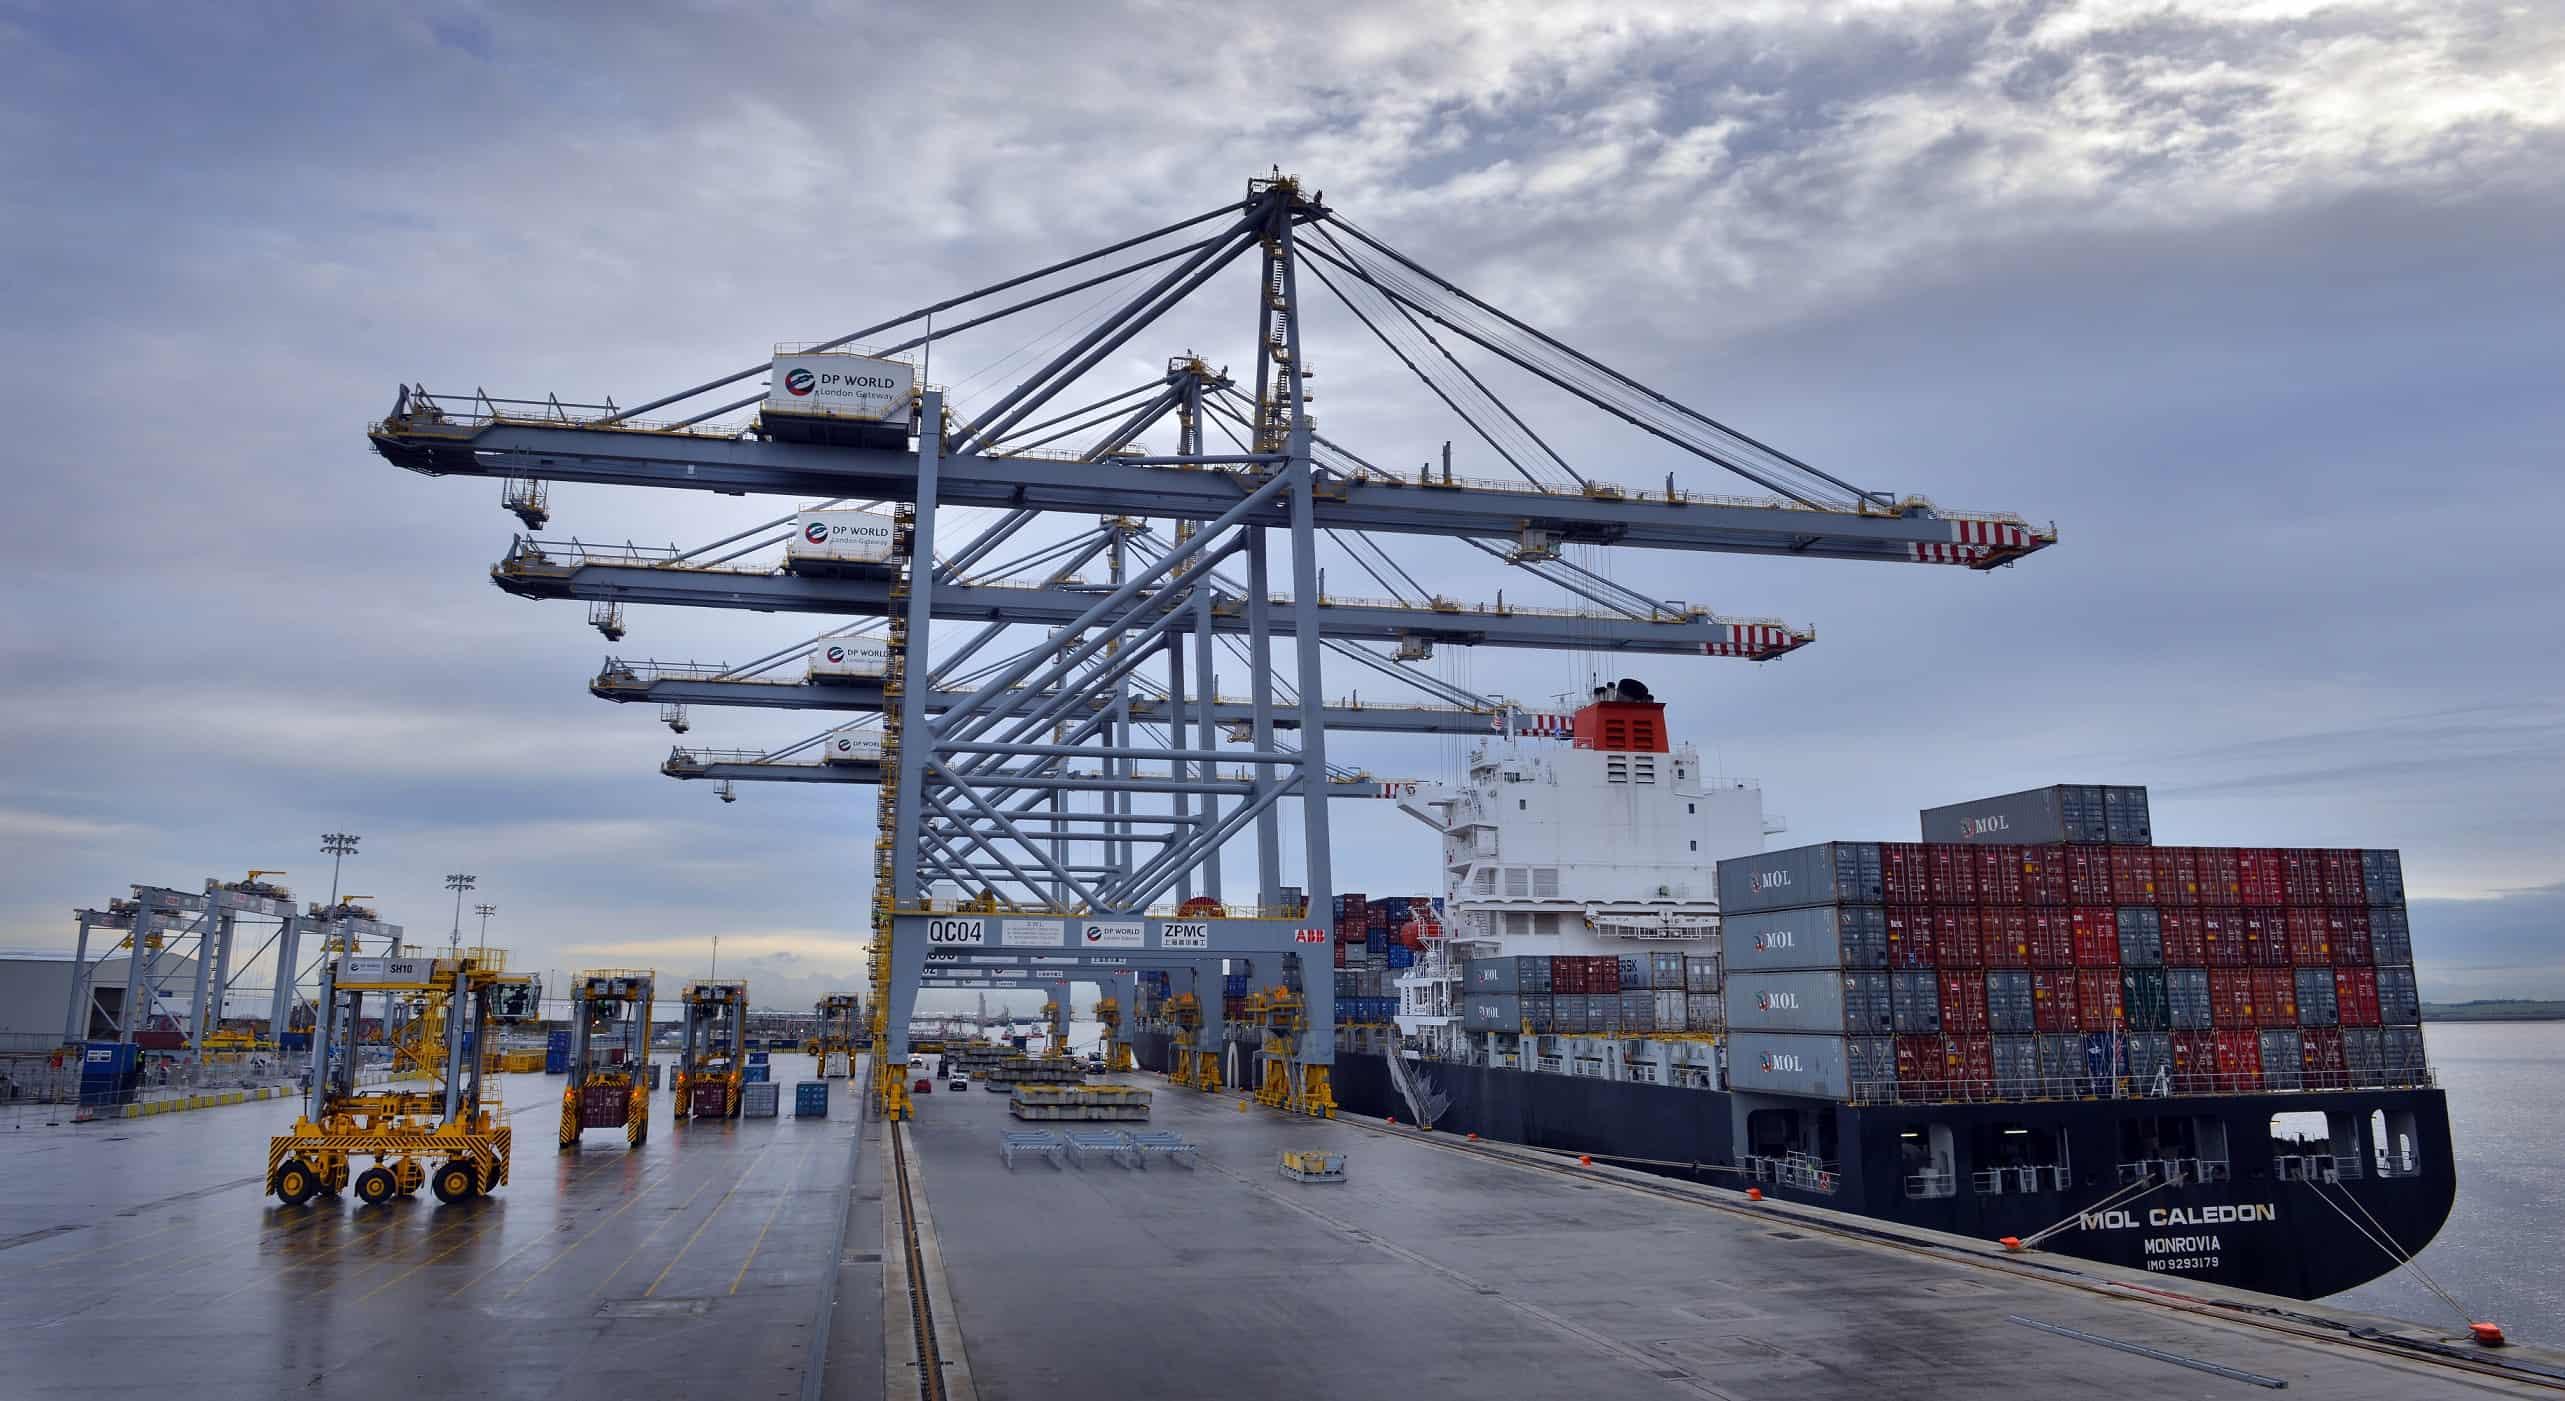 Maersk diverts ships from Felixstowe to London Gateway